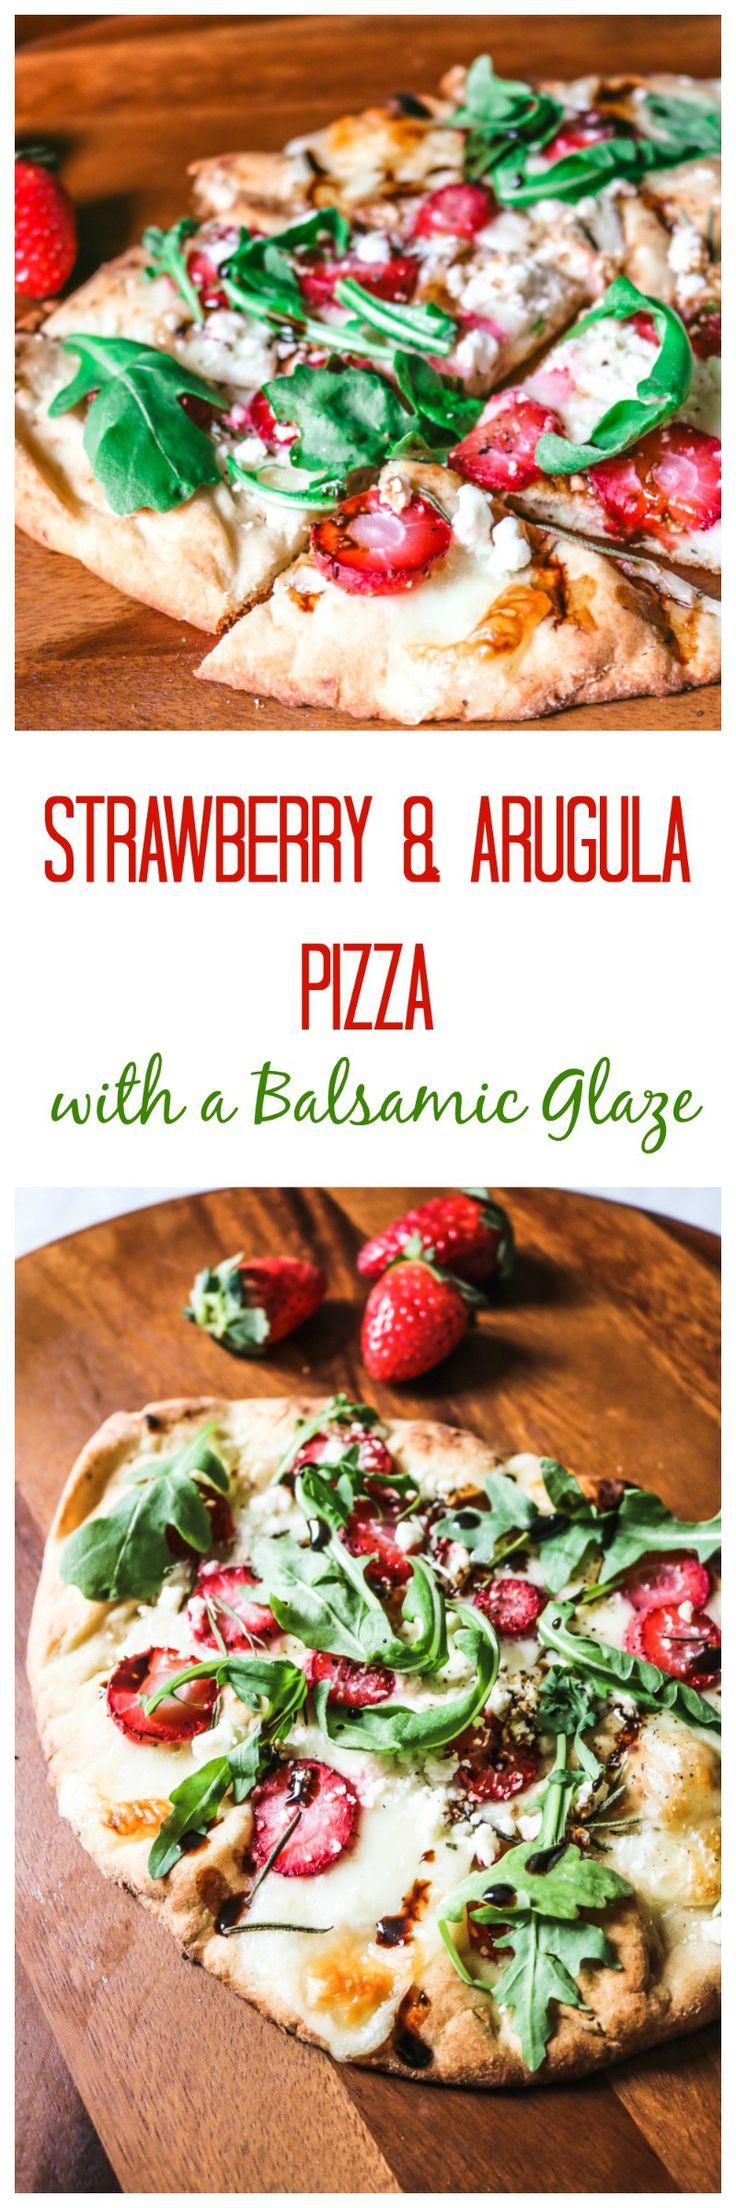 Savory Strawberry Pizza with Balasmic, Feta, Rosemary and Arugula